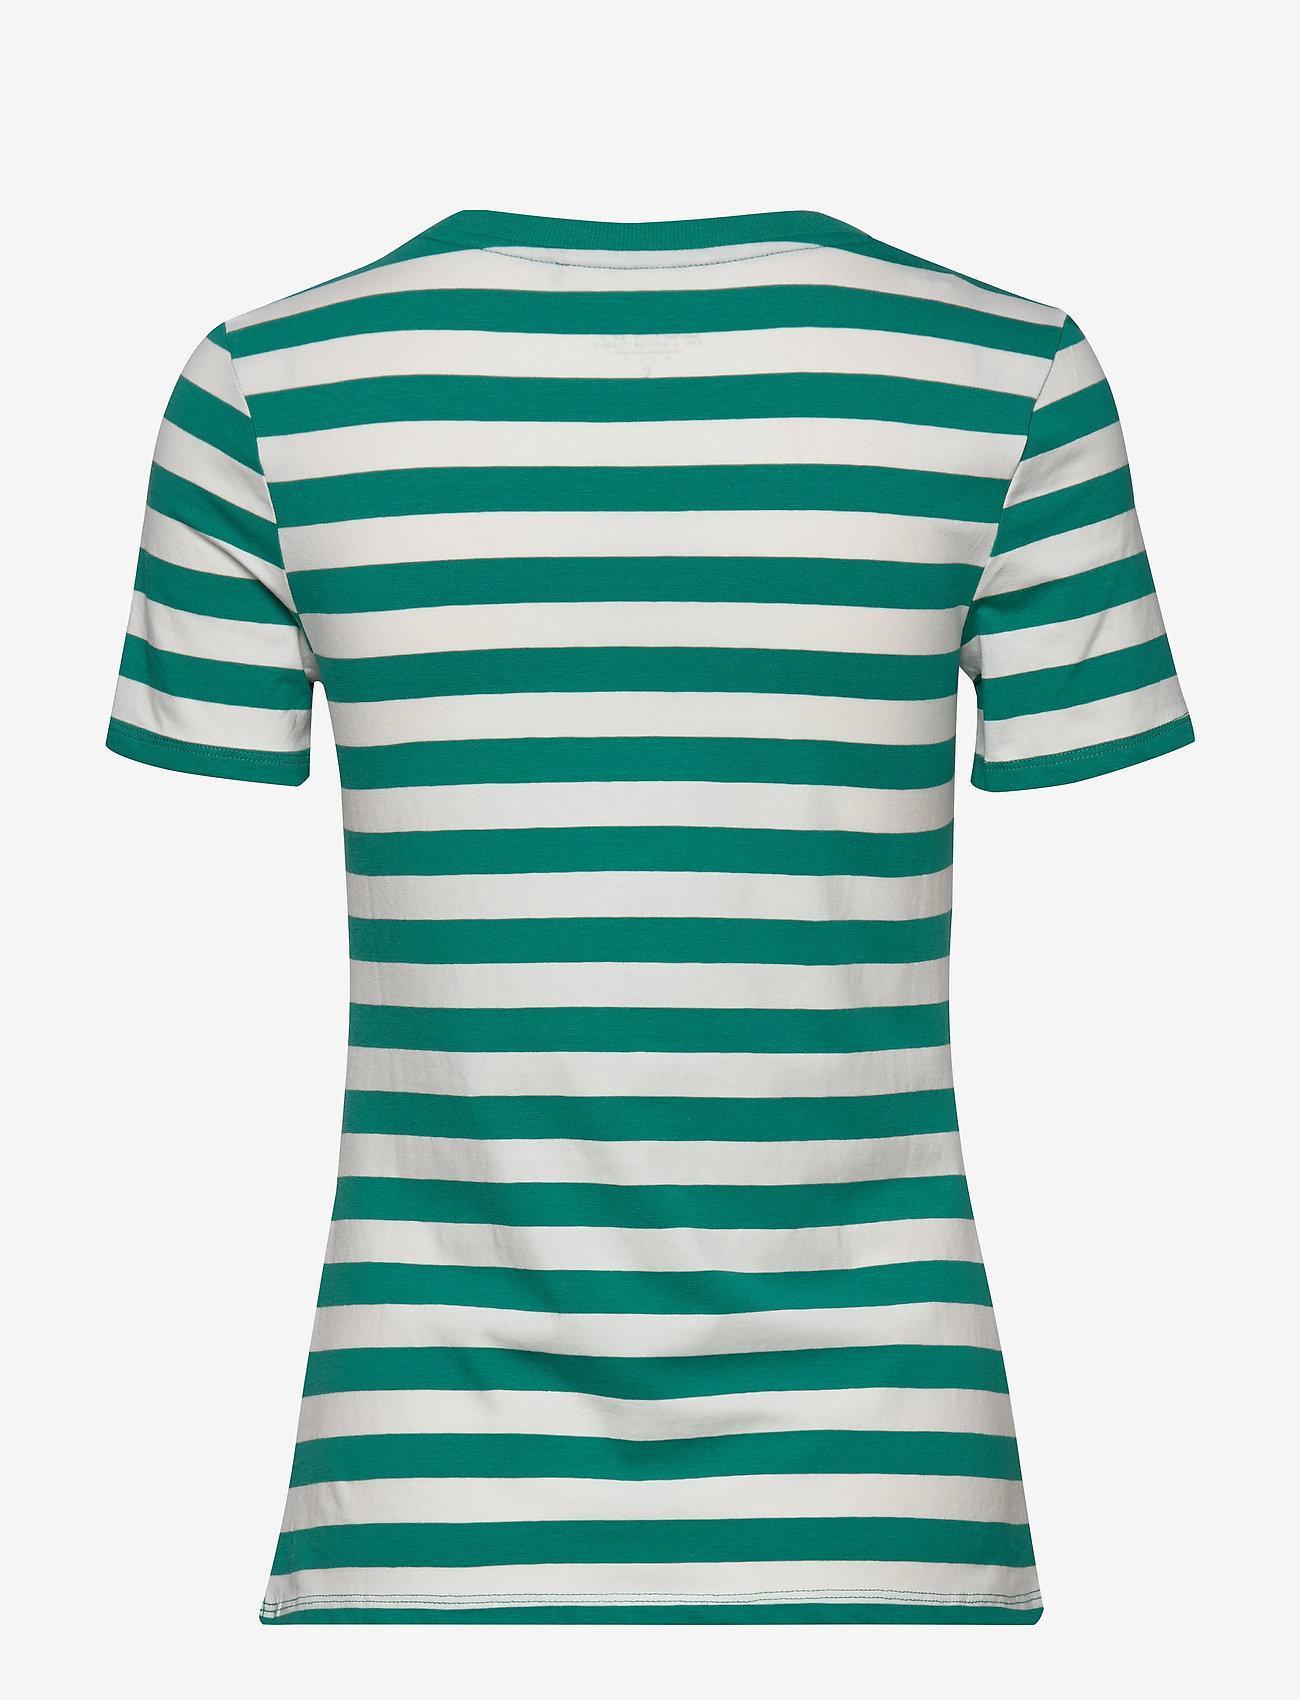 T-shirts (Teal Green 4) (155.99 kr) - Esprit Casual